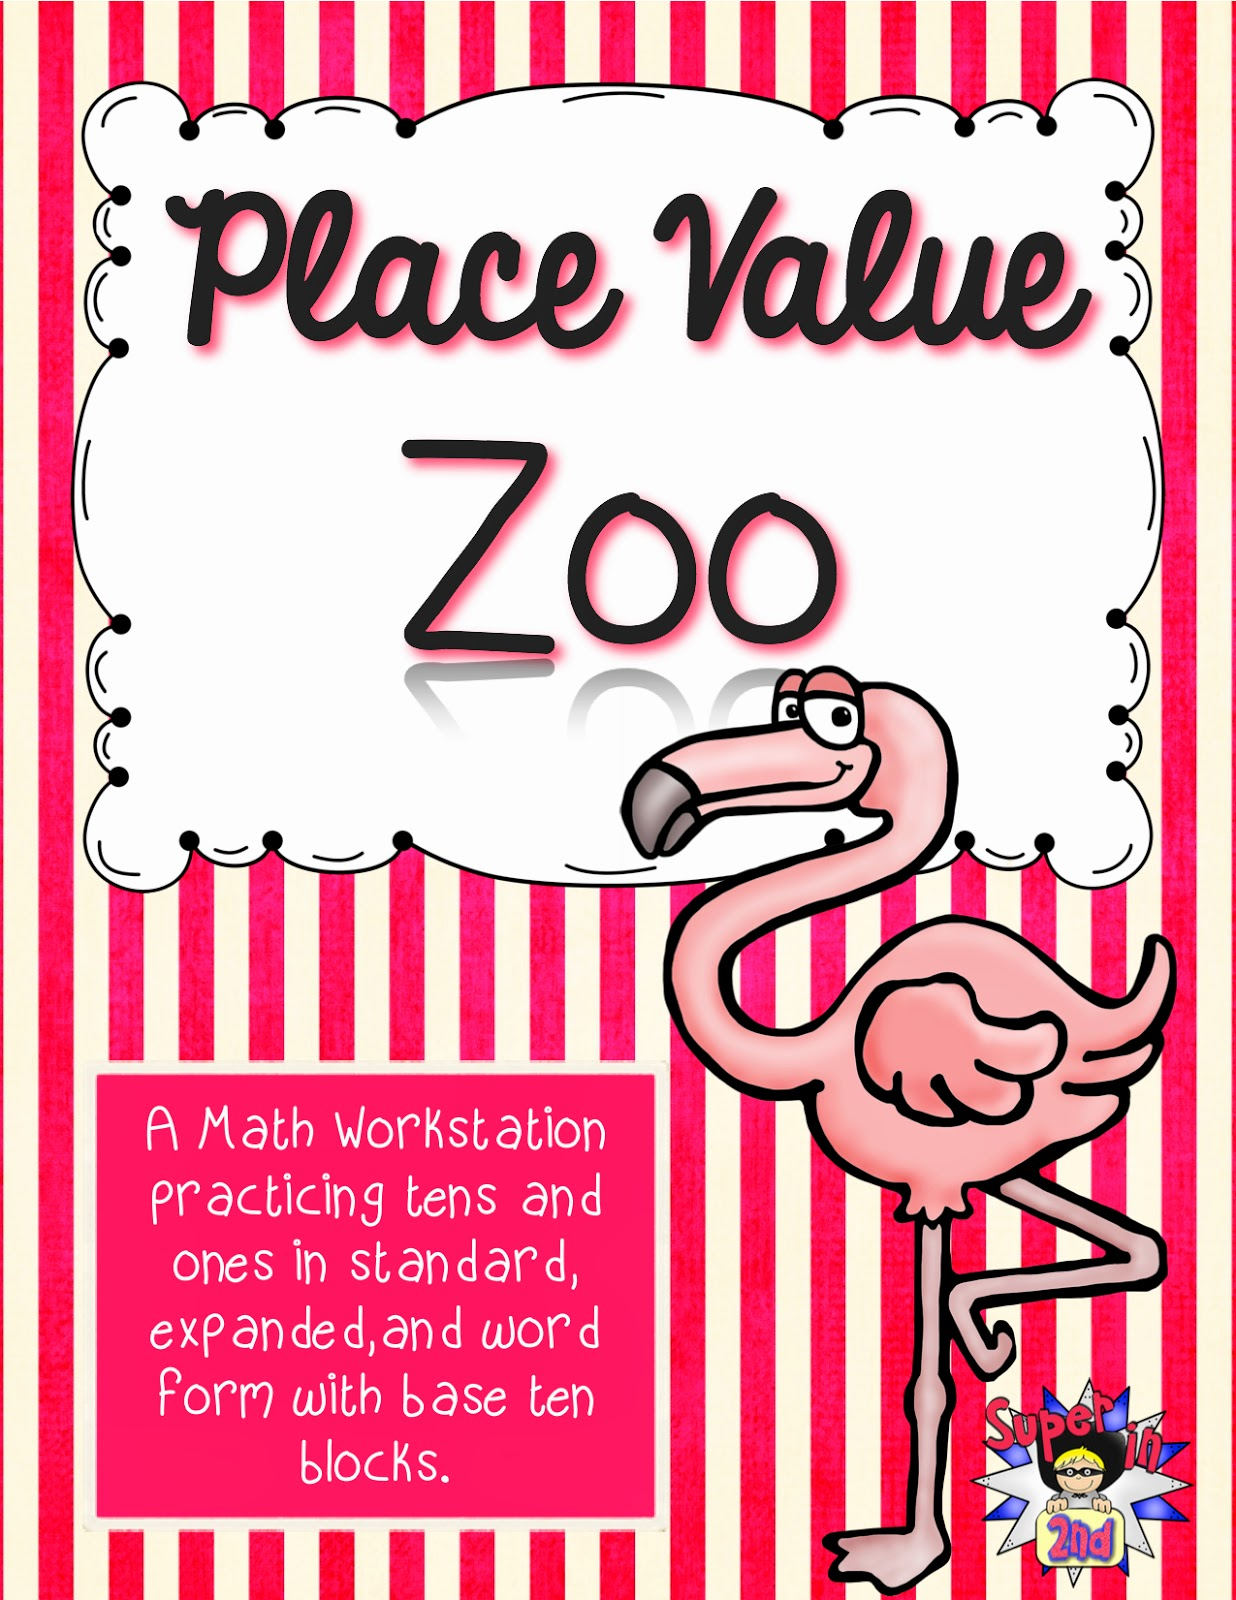 https://www.teacherspayteachers.com/Product/Place-Value-Zoo-1266426